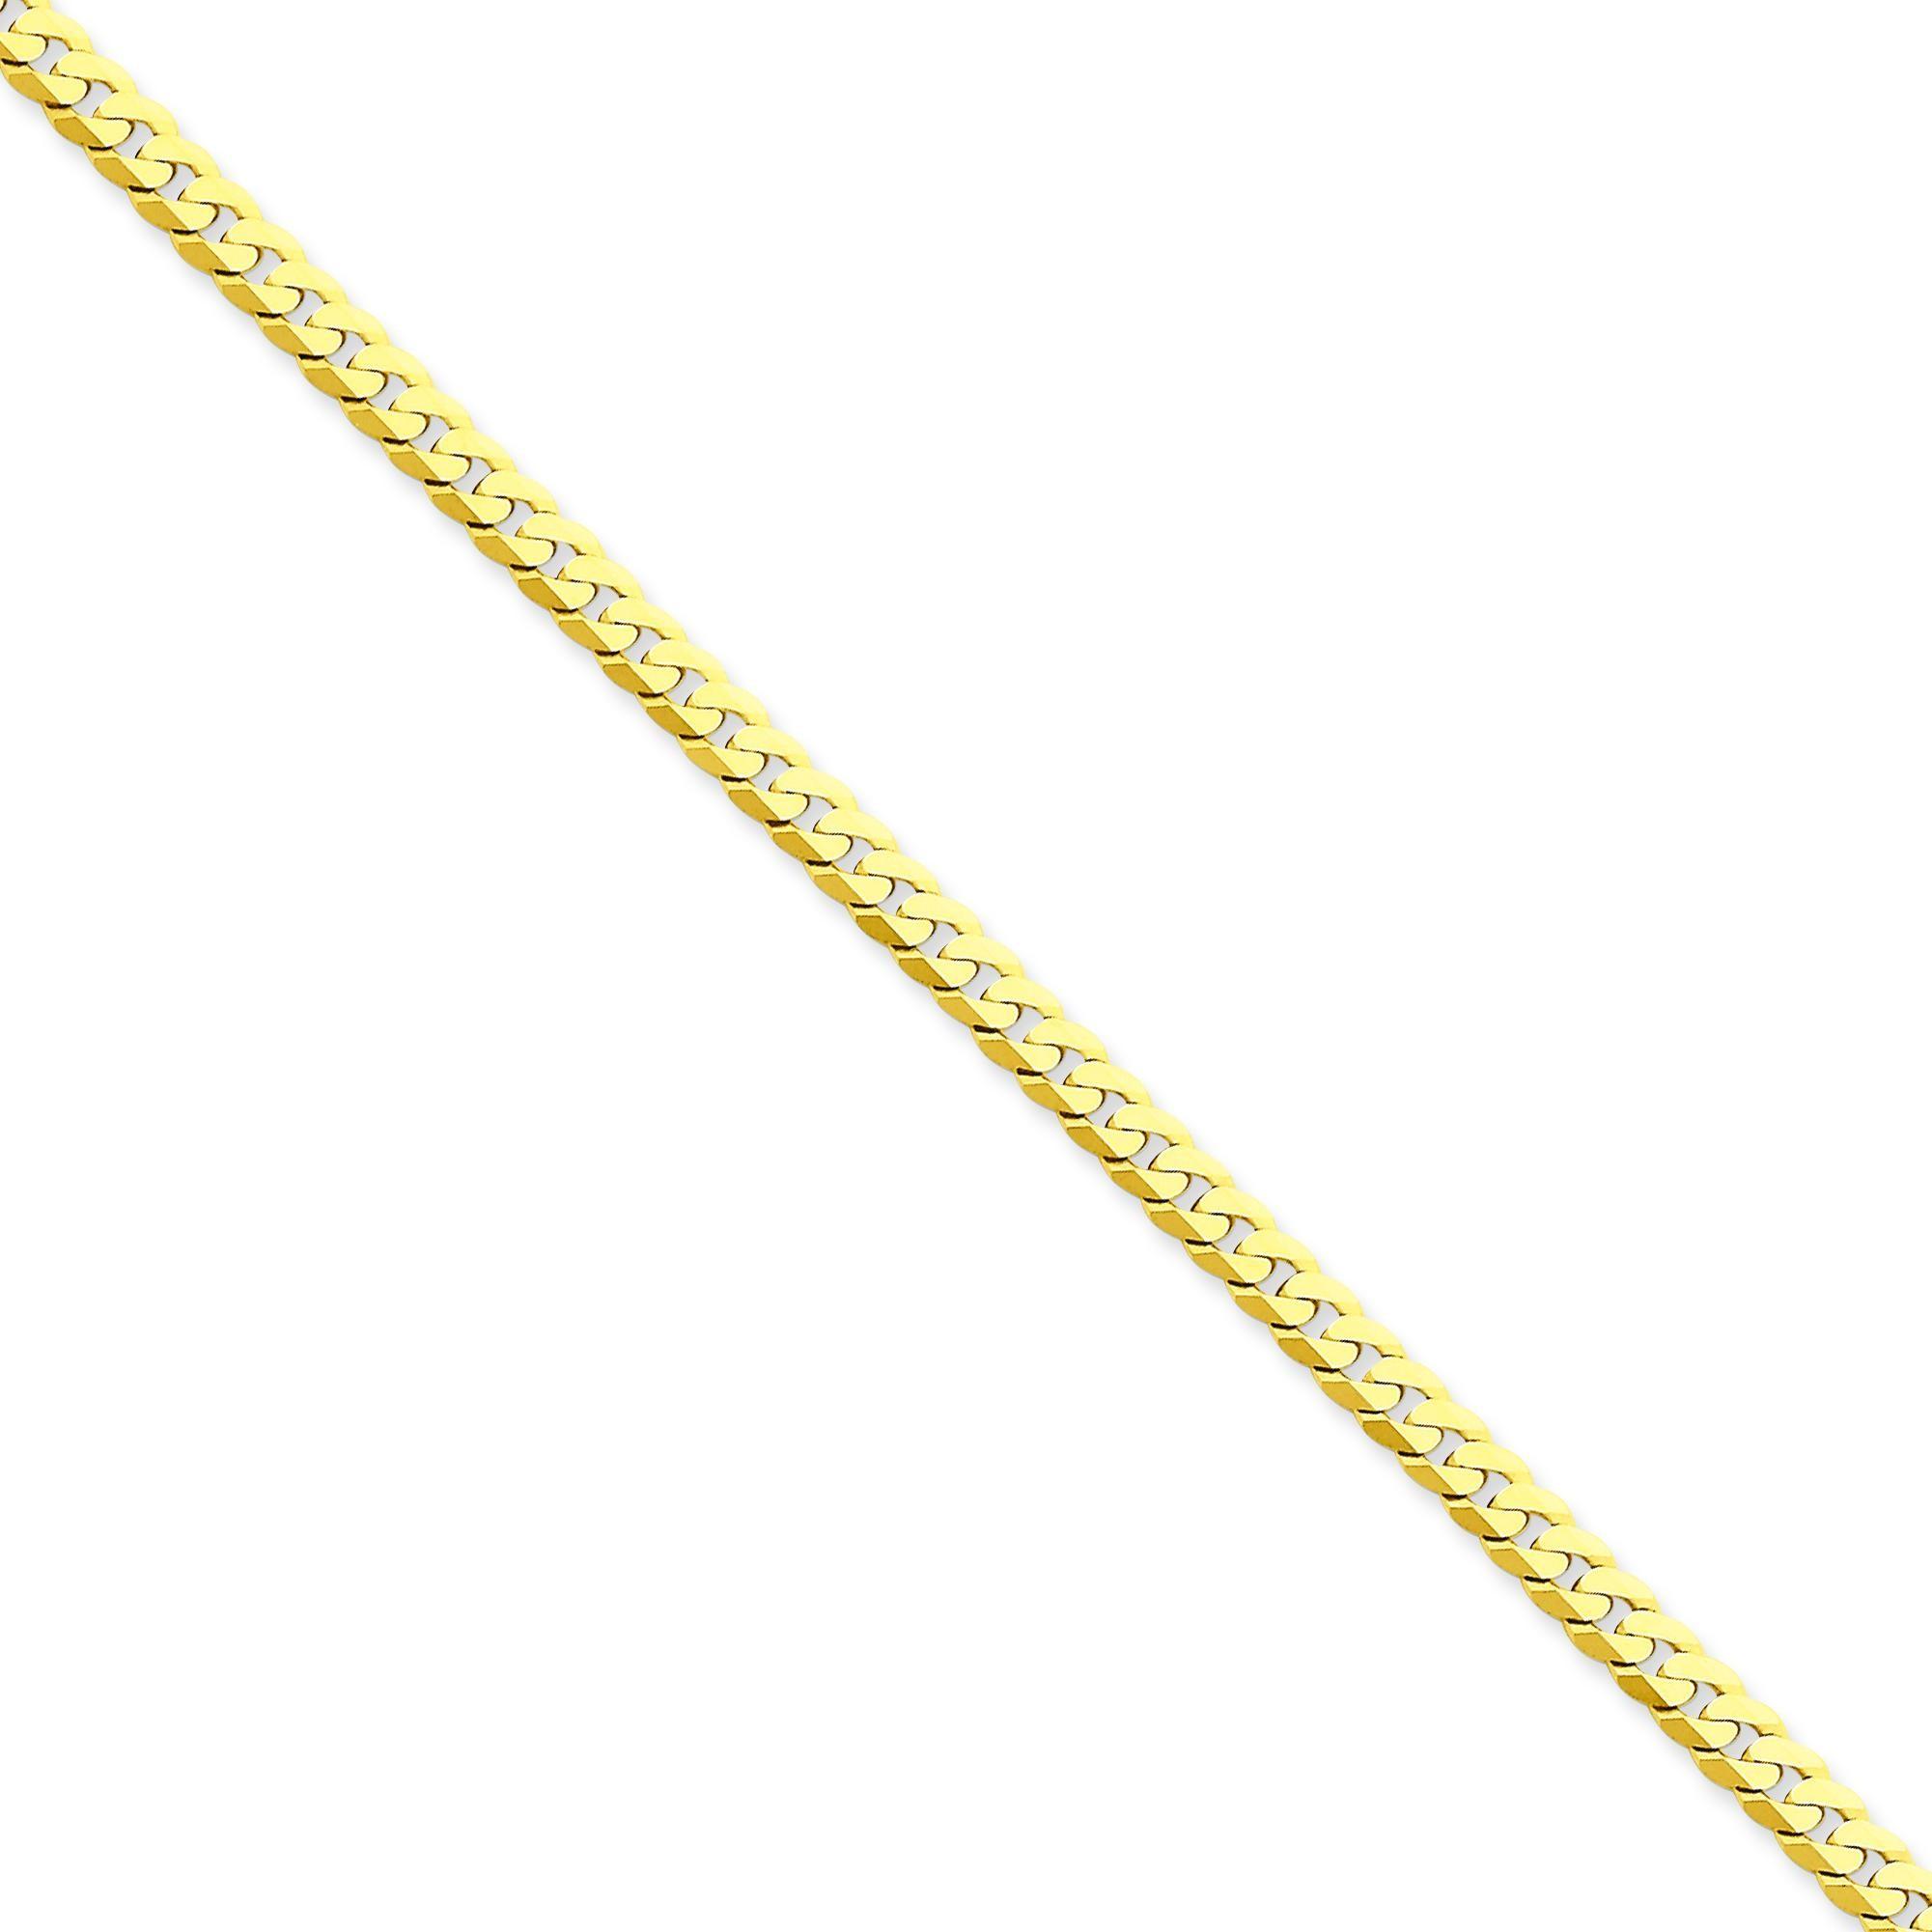 14k Yellow Gold 7 inch 4.20 mm Flat Beveled Curb Chain Bracelet